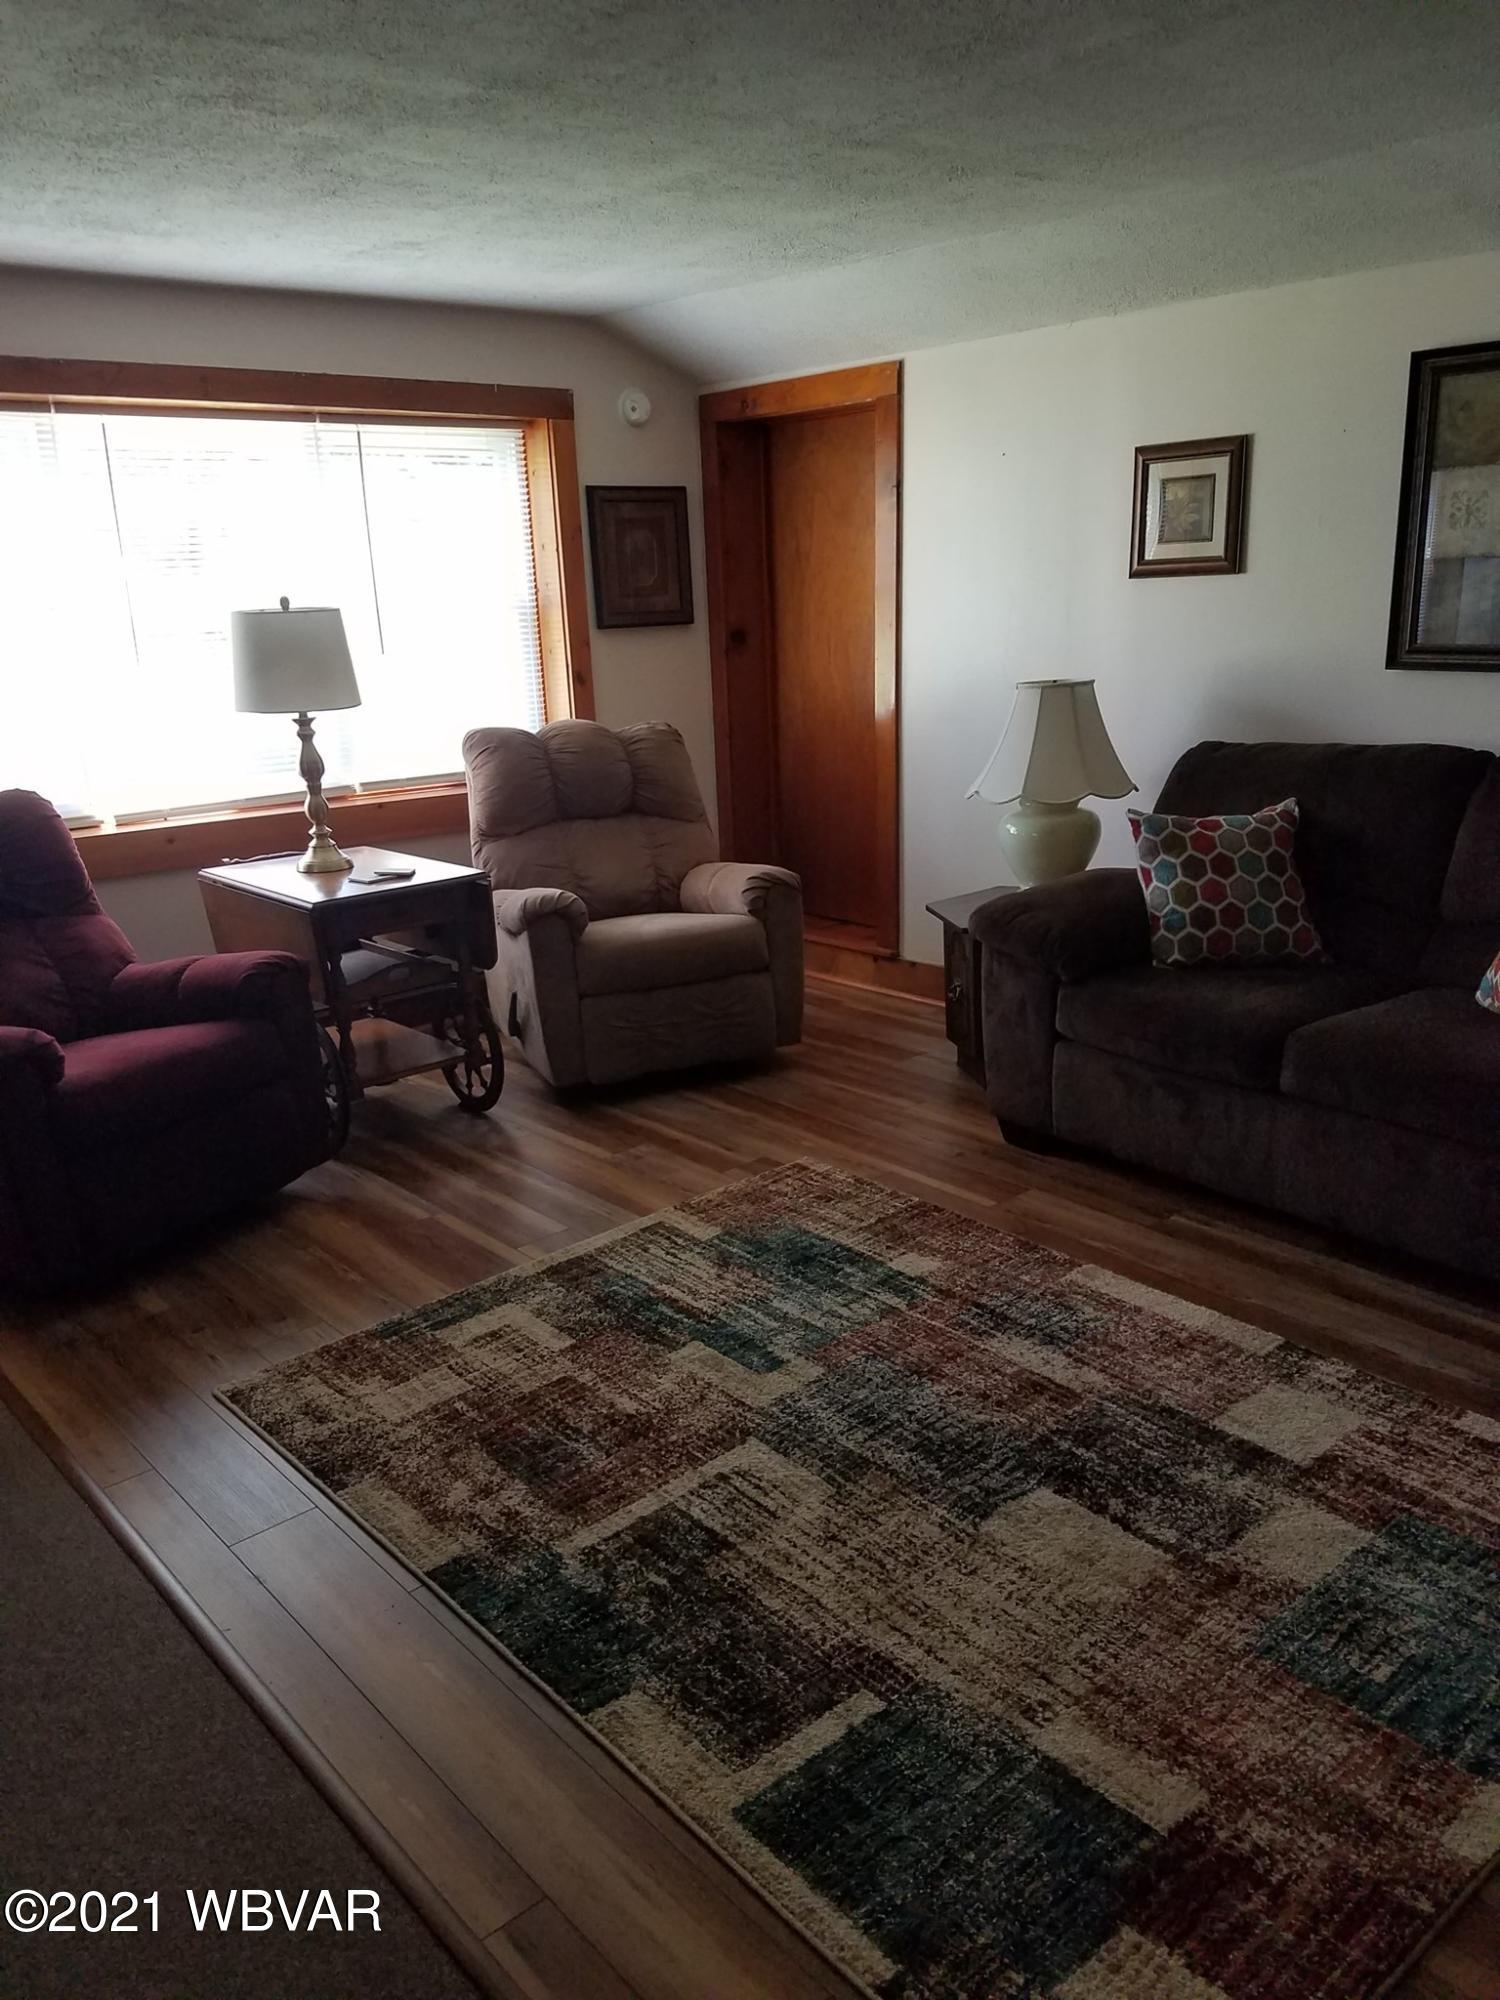 717 TORBERT LANE, Jersey Shore, PA 17740, 2 Bedrooms Bedrooms, ,1 BathroomBathrooms,Residential,For sale,TORBERT,WB-92470